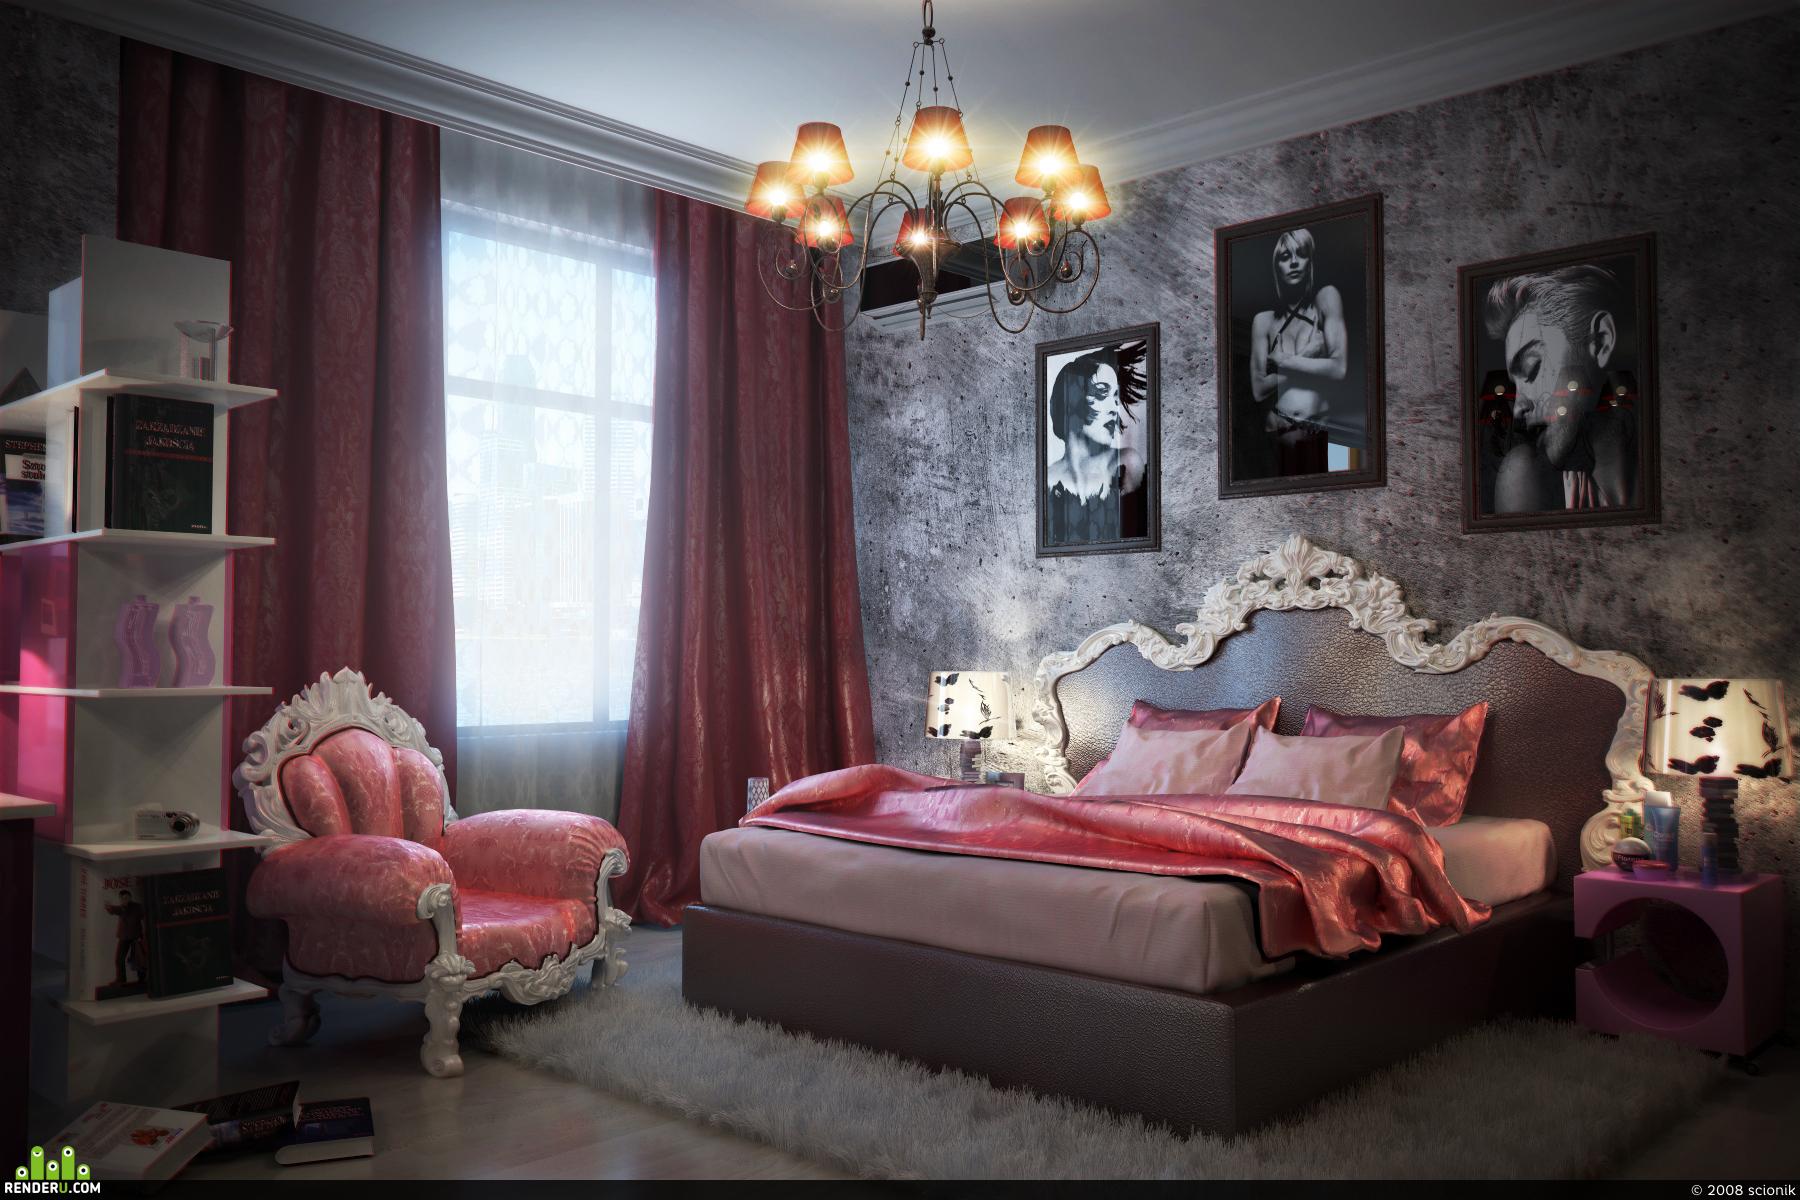 preview гламурная спальня 17-ти летней девочки